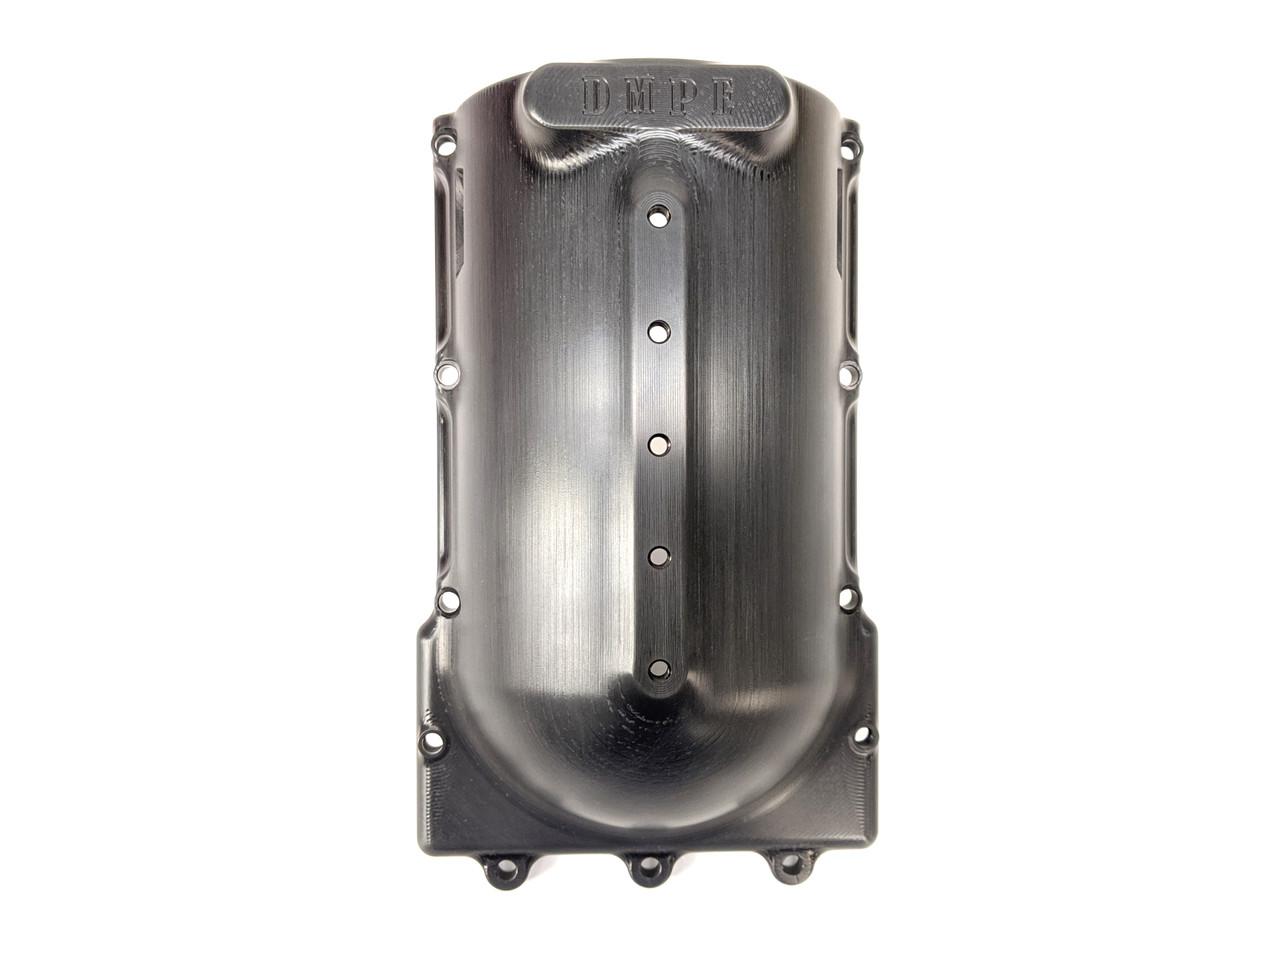 Screw Compressor Burst Tower DMPE 800-066-99-236